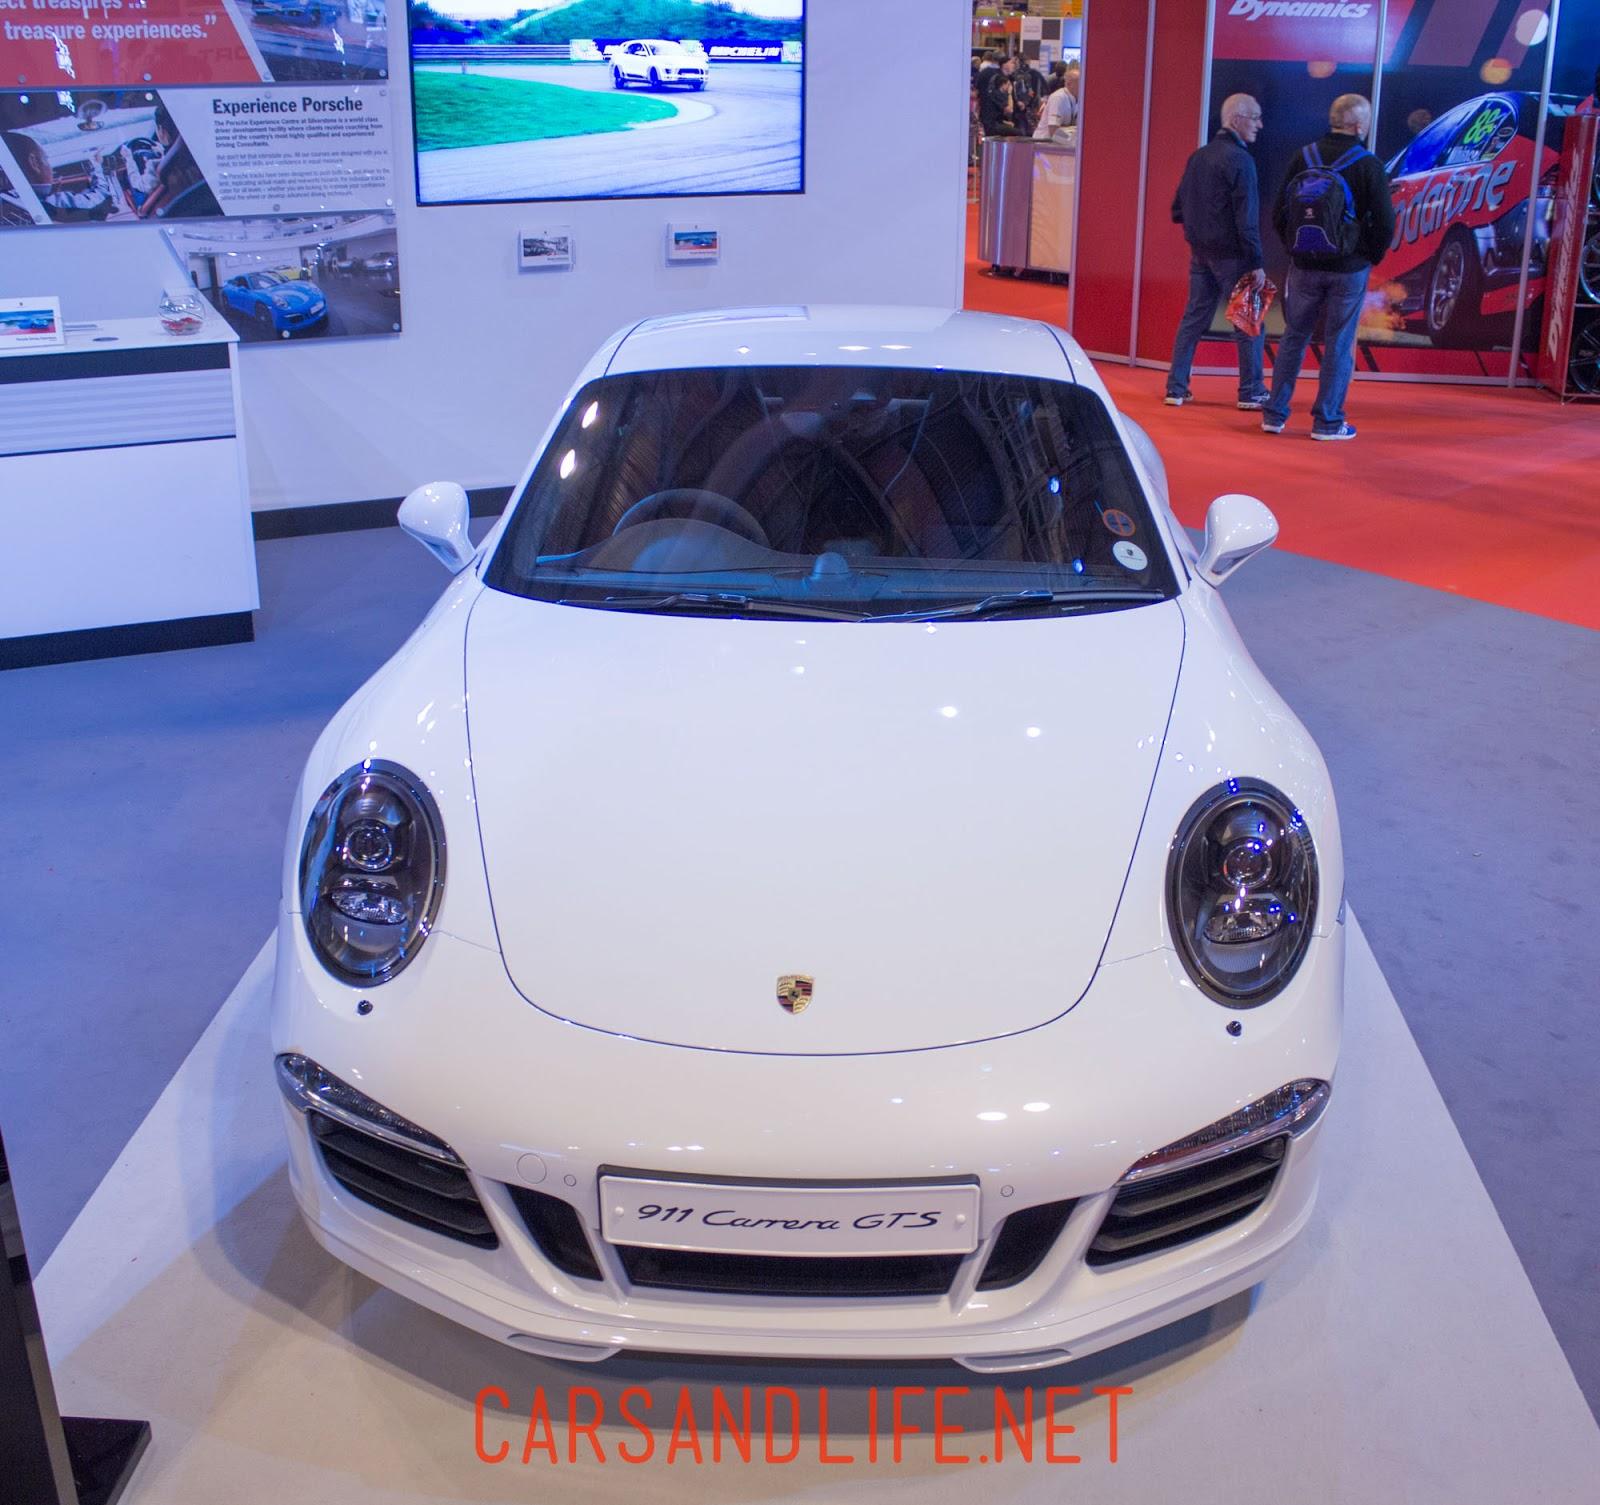 Porsche 911 Gts Engine: Porsche 911 Carrera 4 GTS